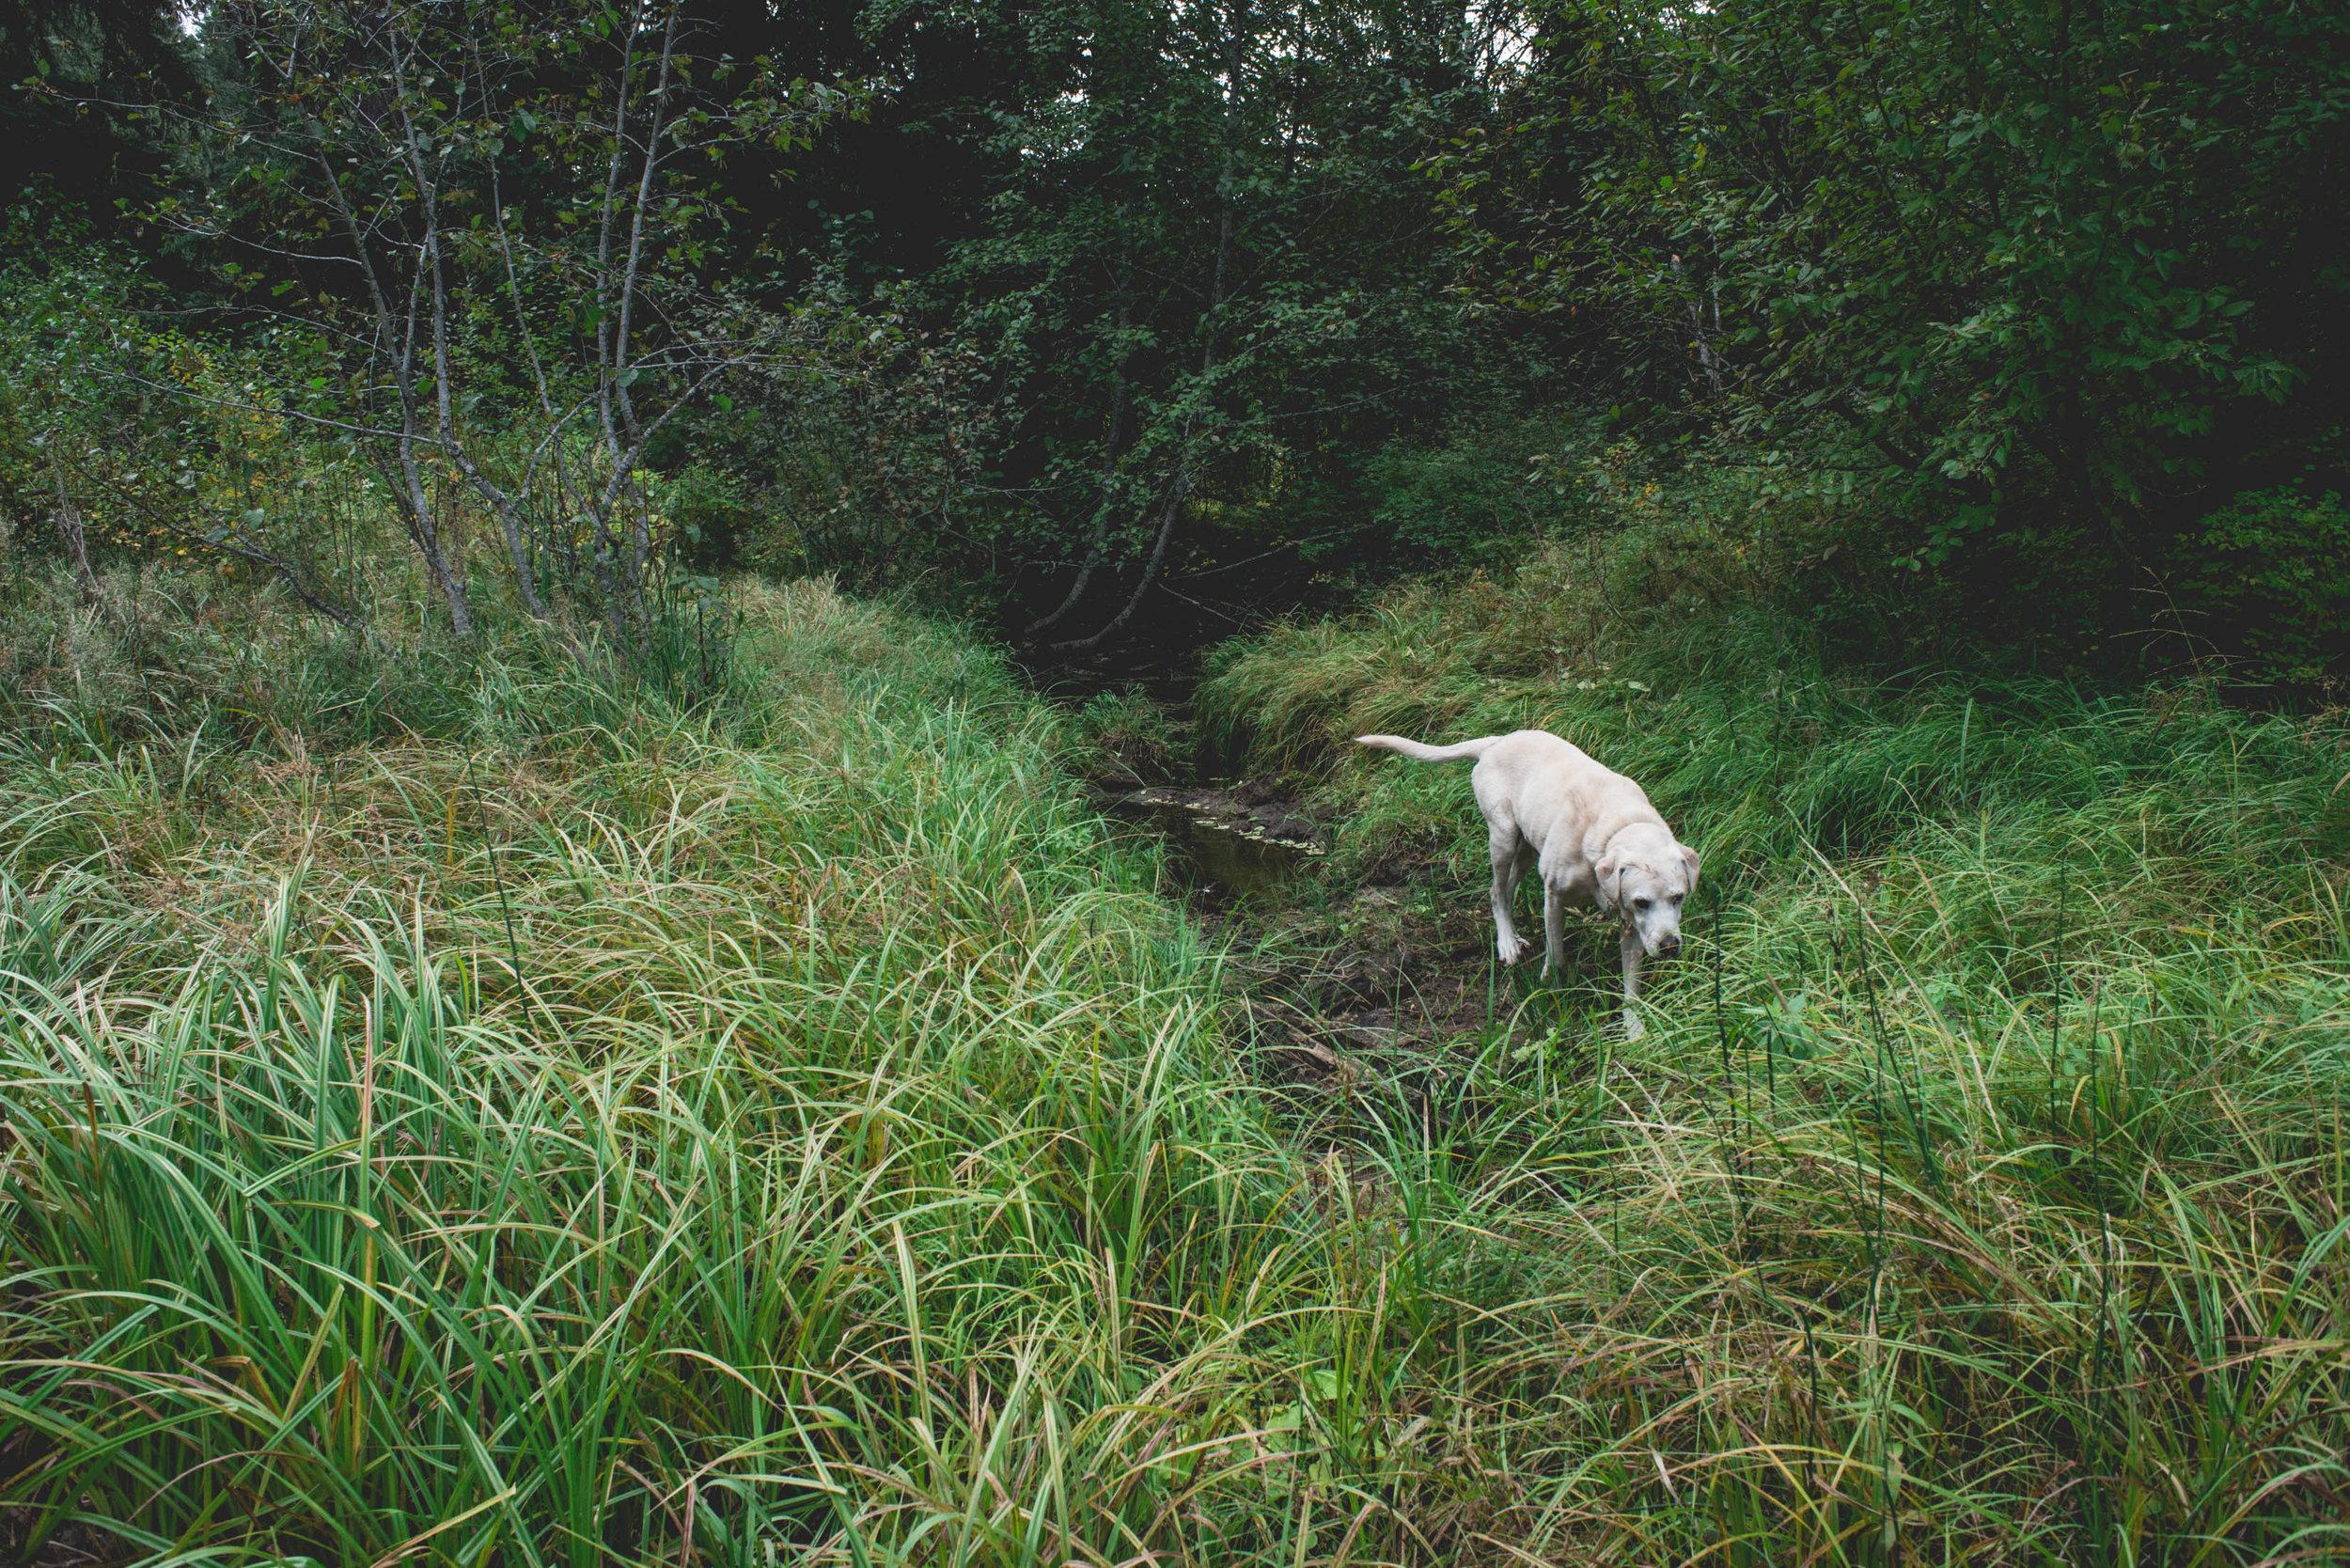 Minam_River_Lodge_Wallowa_Mountains_Eagle_Cap_Wilderness_Oregon_Autumn_2017_Please_Credit_Talia_Jean_Galvin-89.jpg